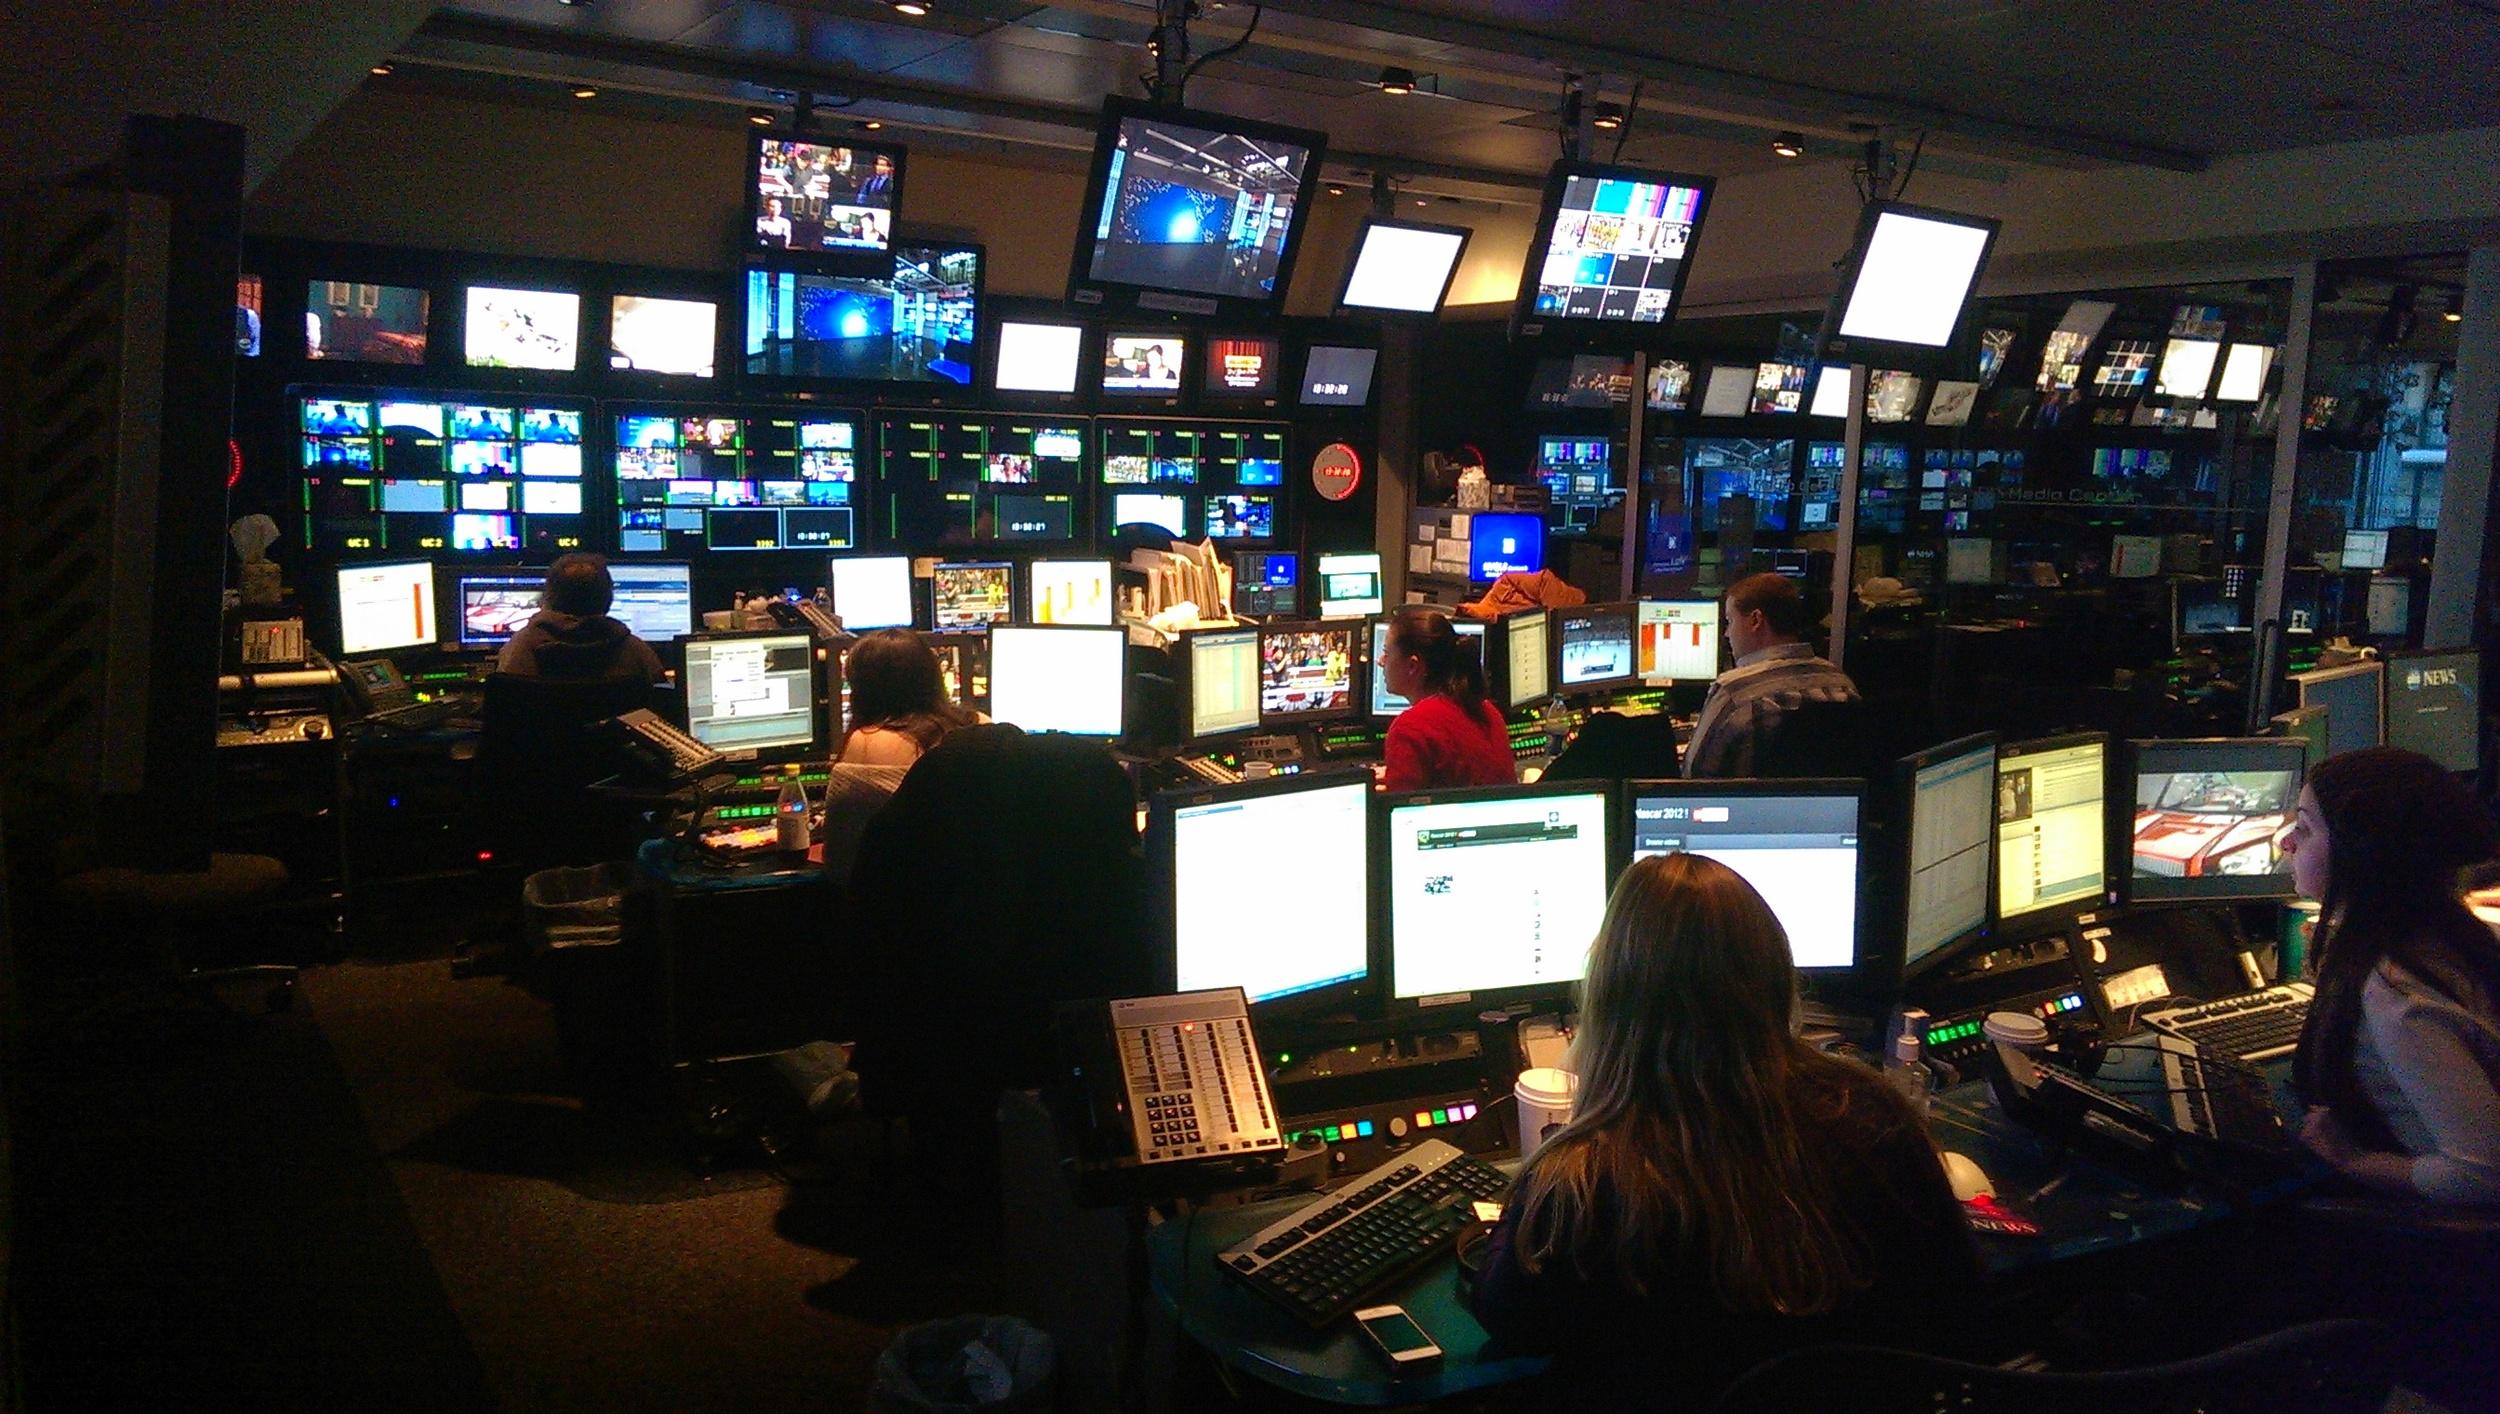 ABC news room